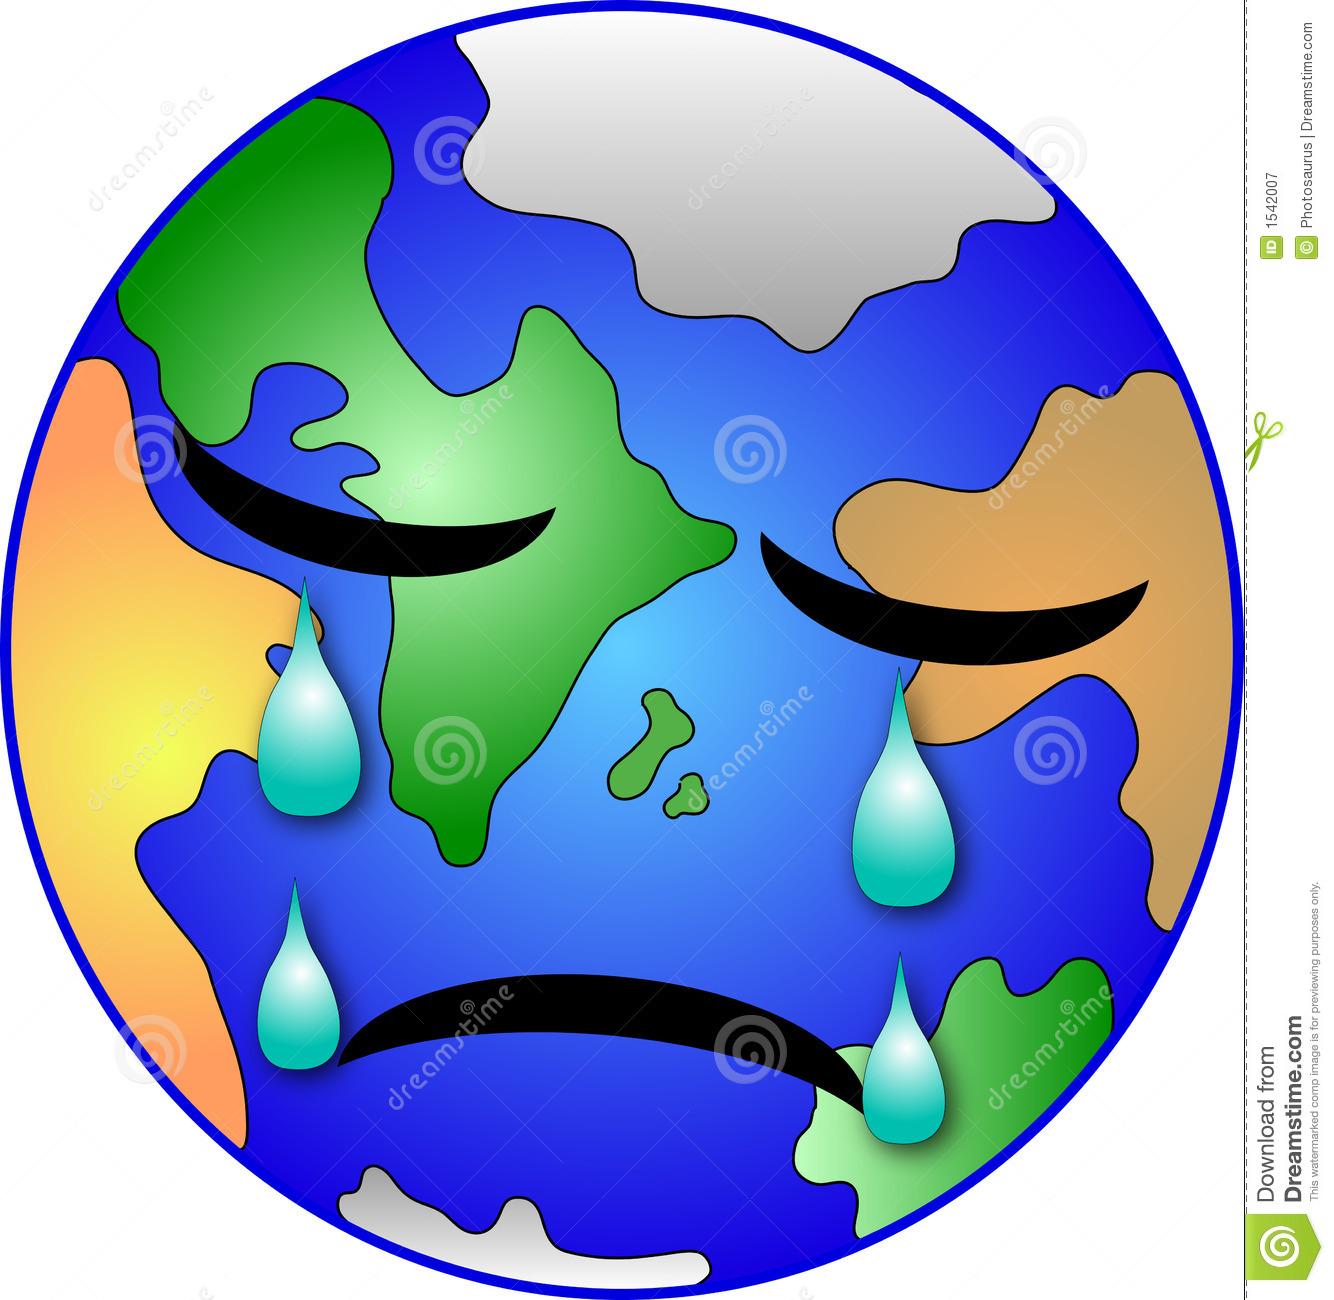 Pollution clipart sad Panda sad%20earth%20clipart Clipart Clipart Sad